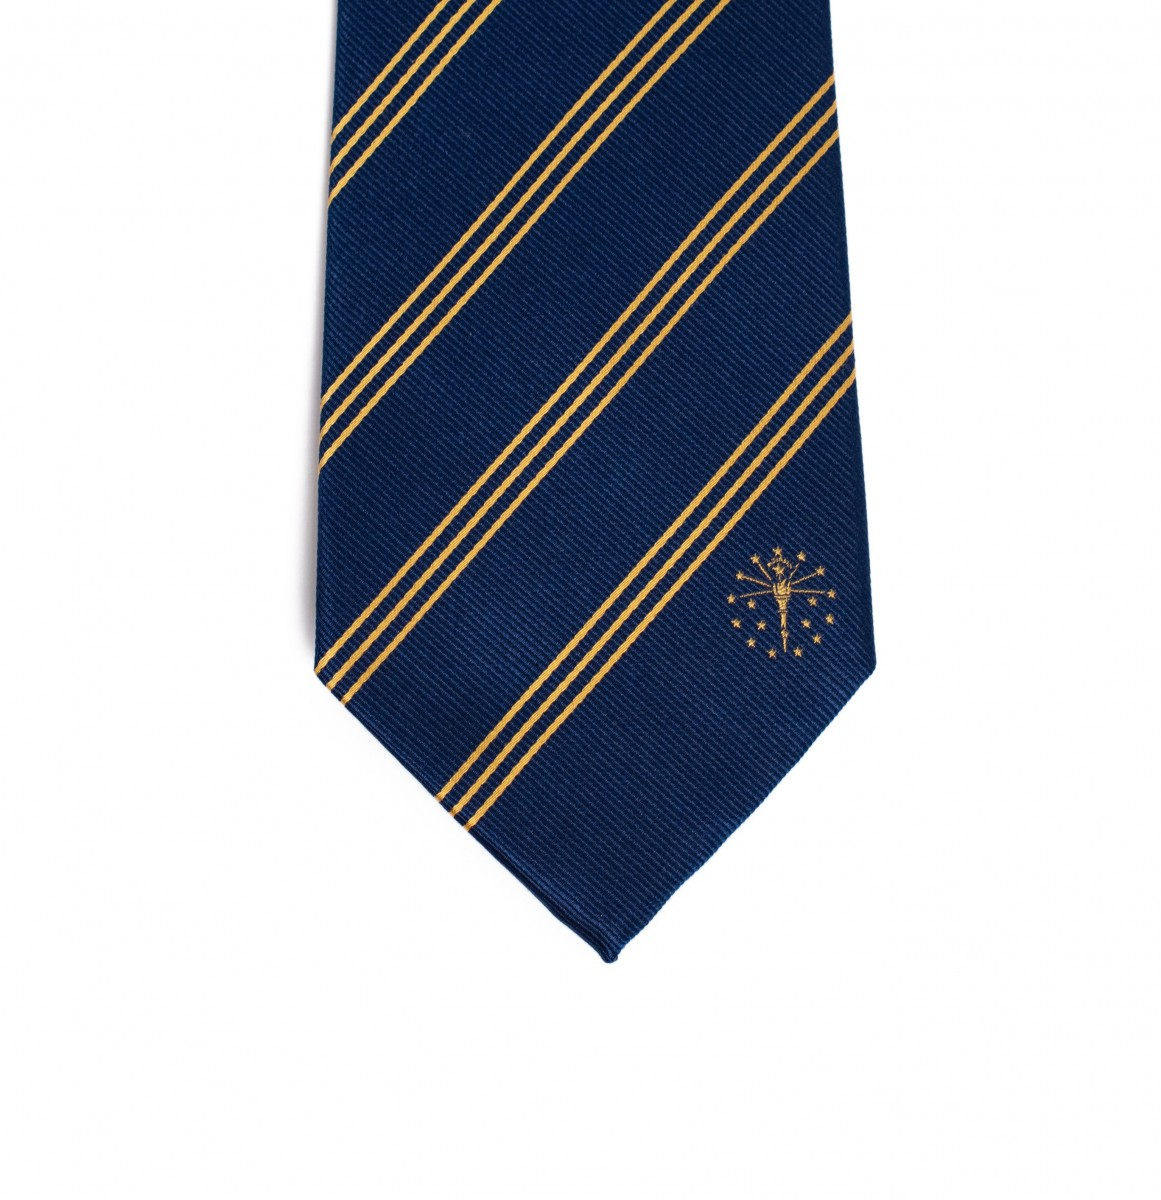 Indiana Tie